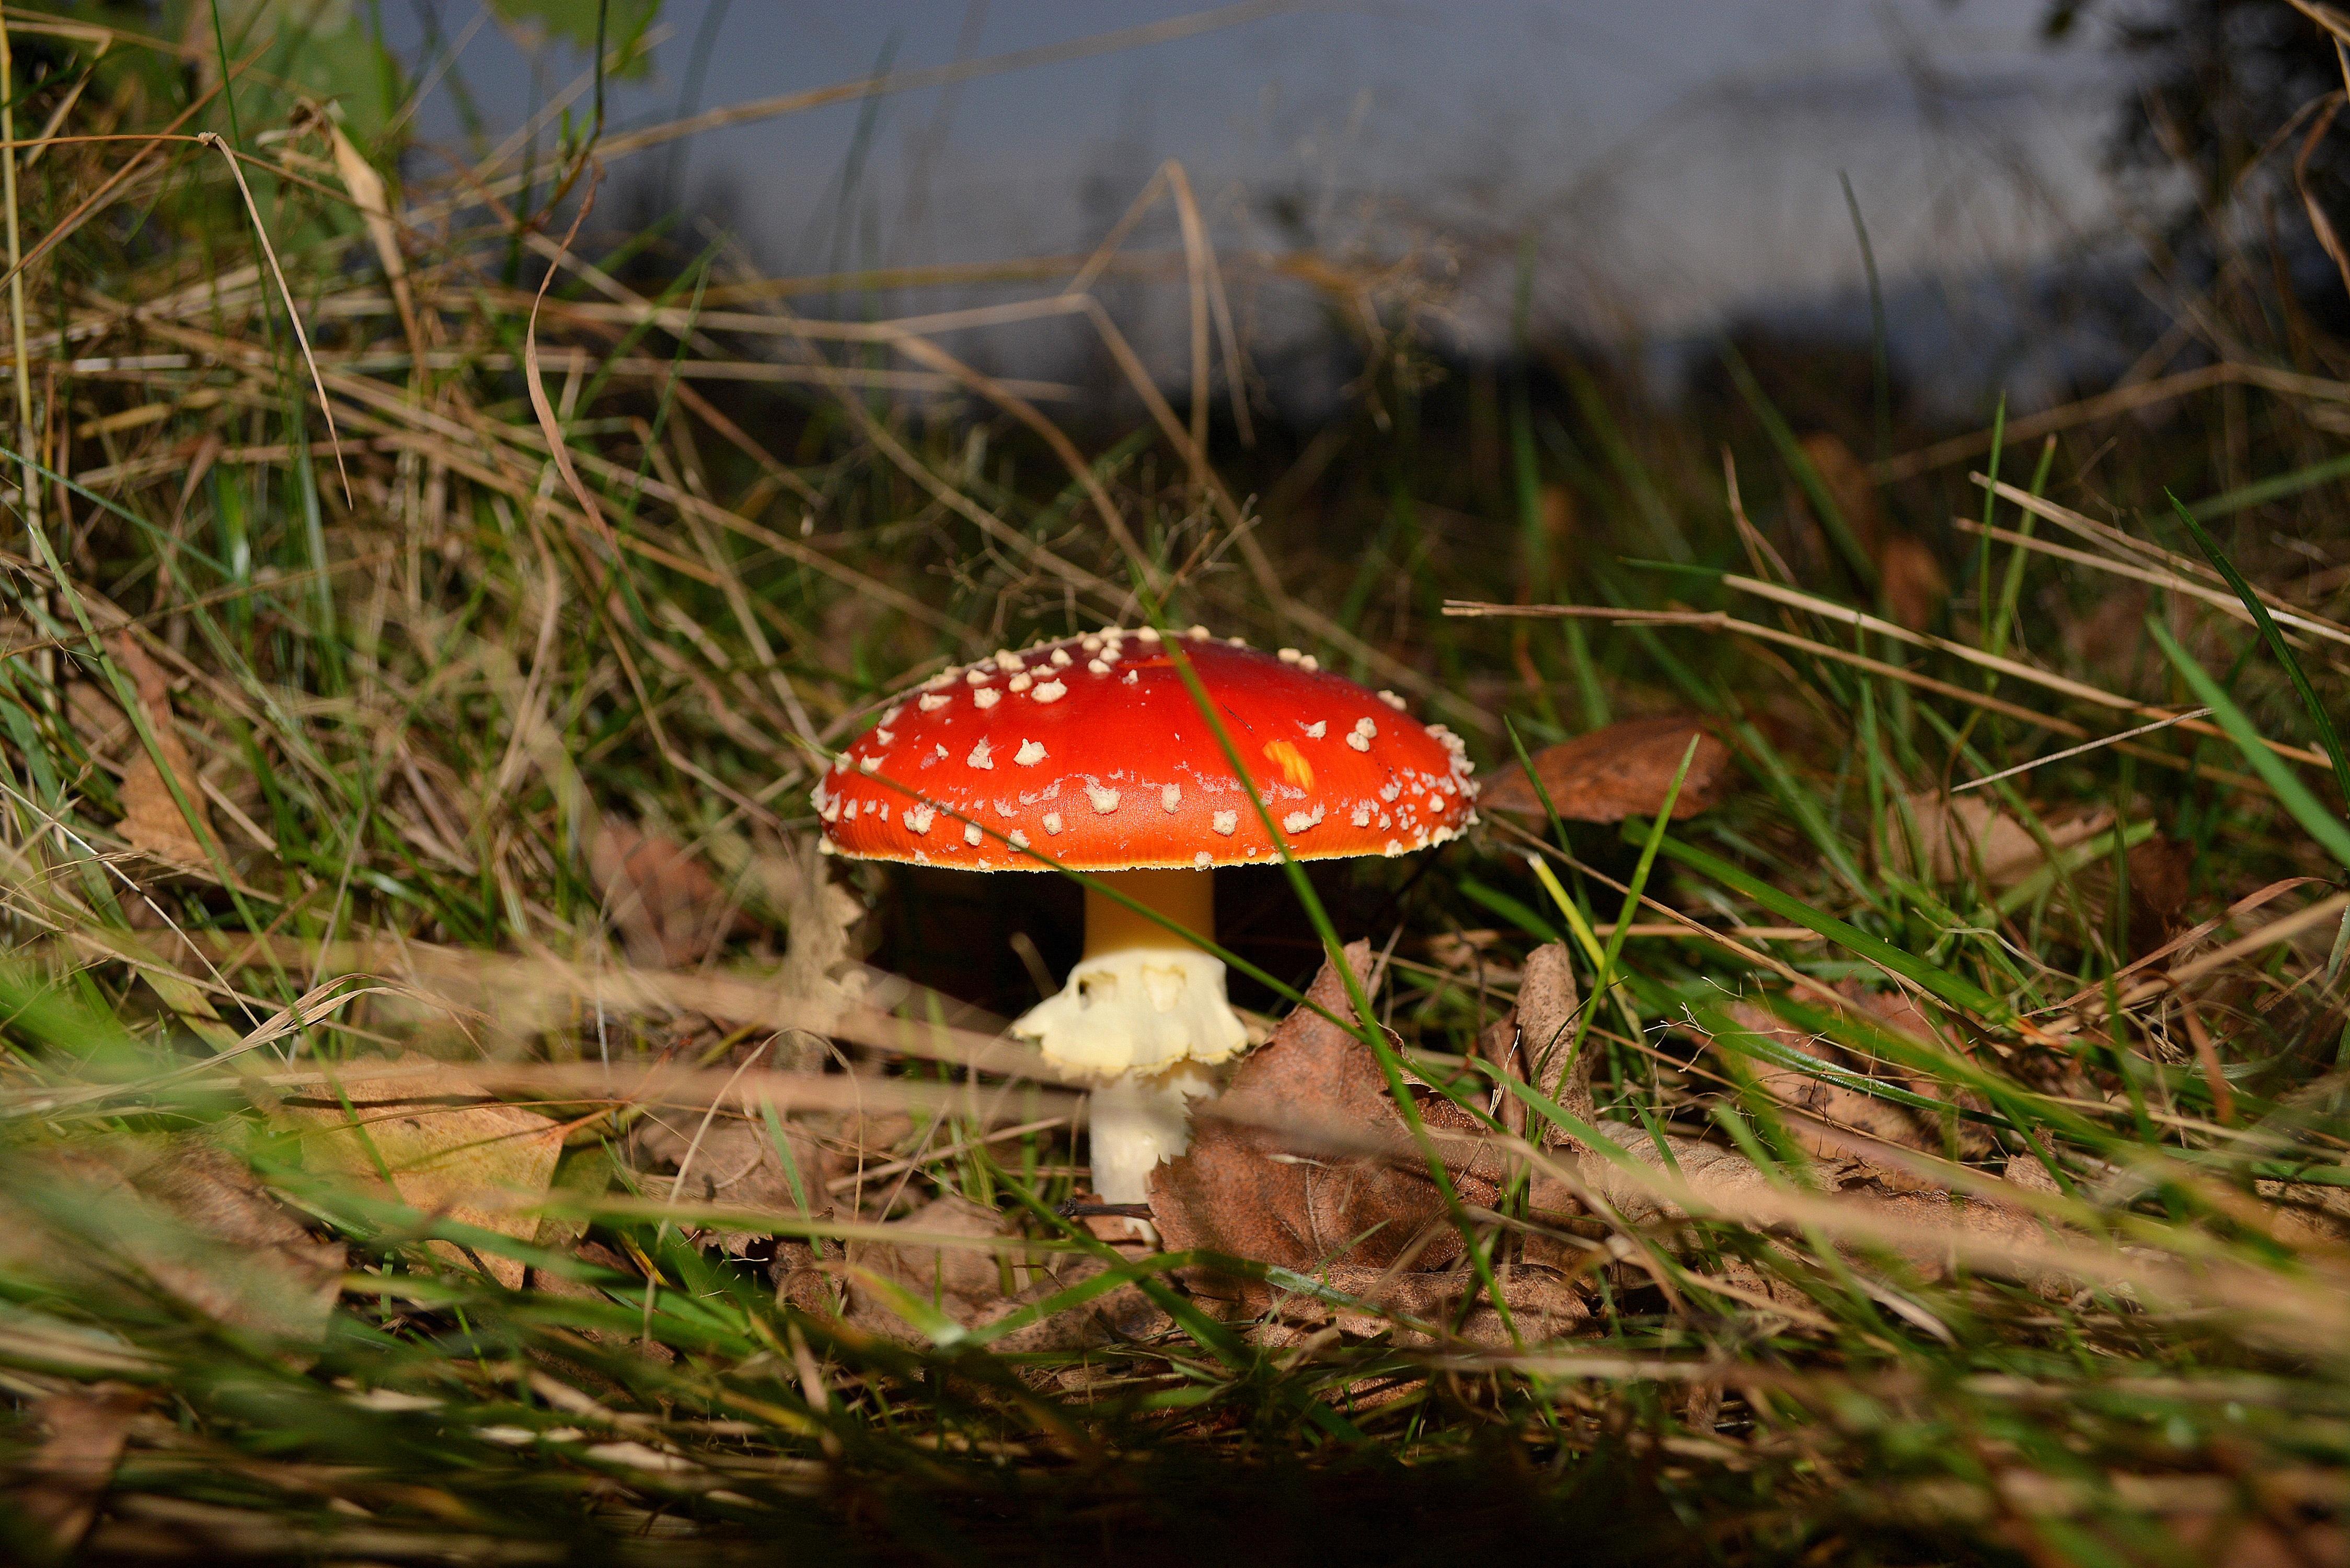 Картинки грибов мухомор поганка пошаговое